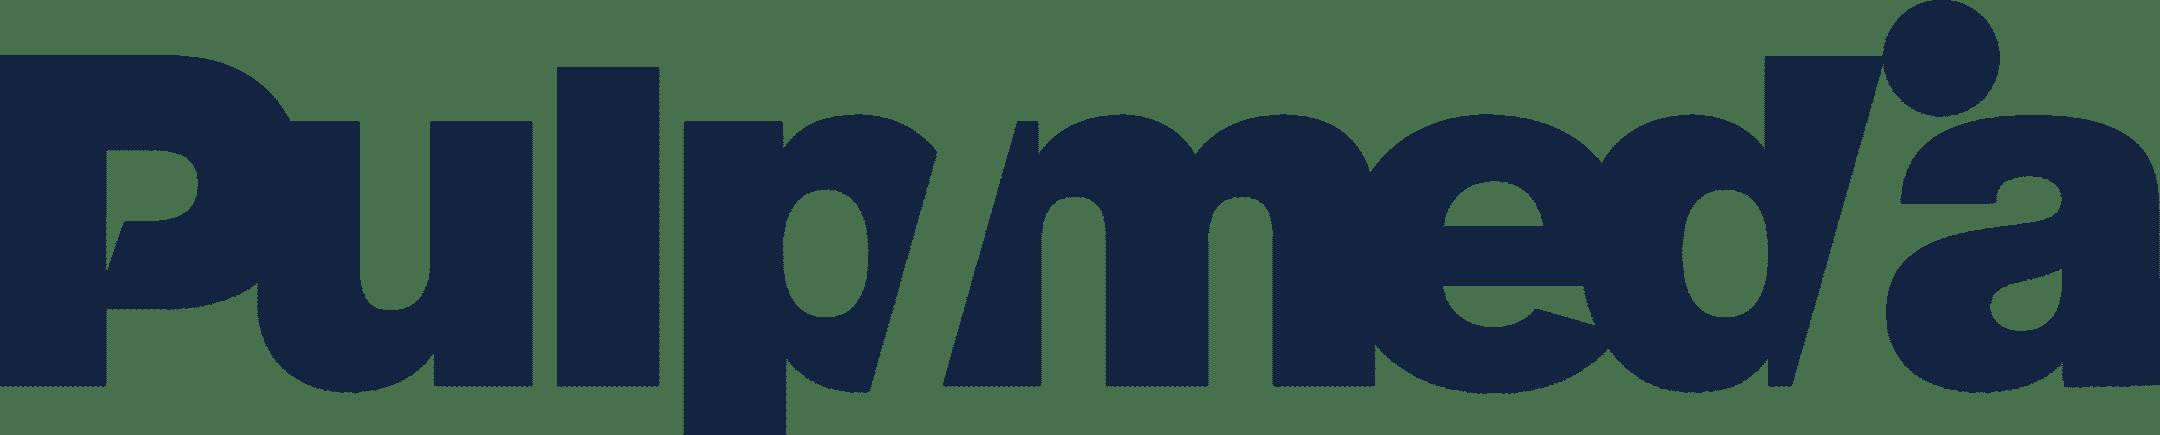 Logo Pulpmedia dunkelblau